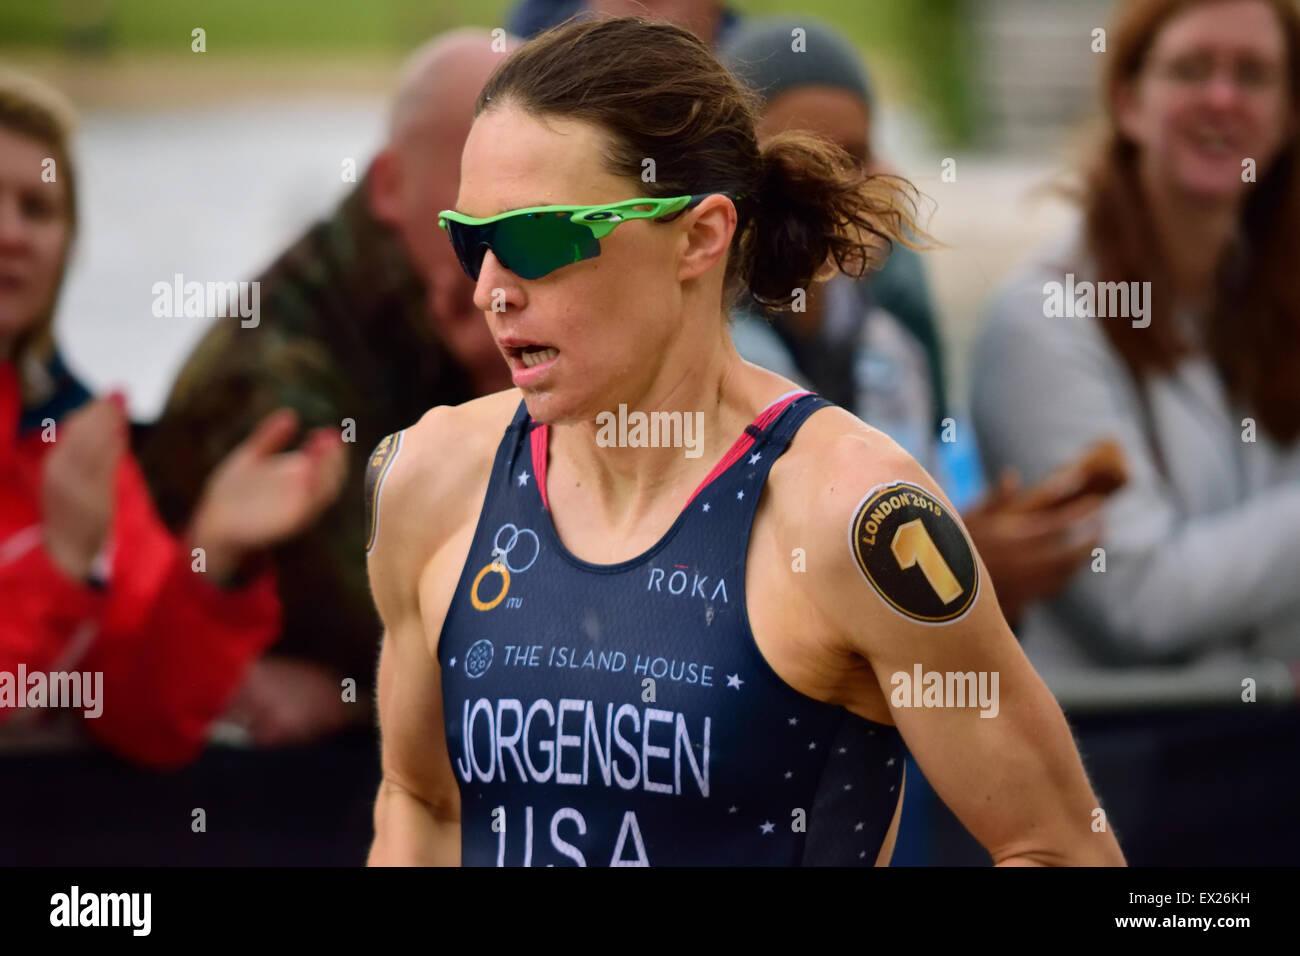 Gwen Jorgensen running in a race - Stock Image